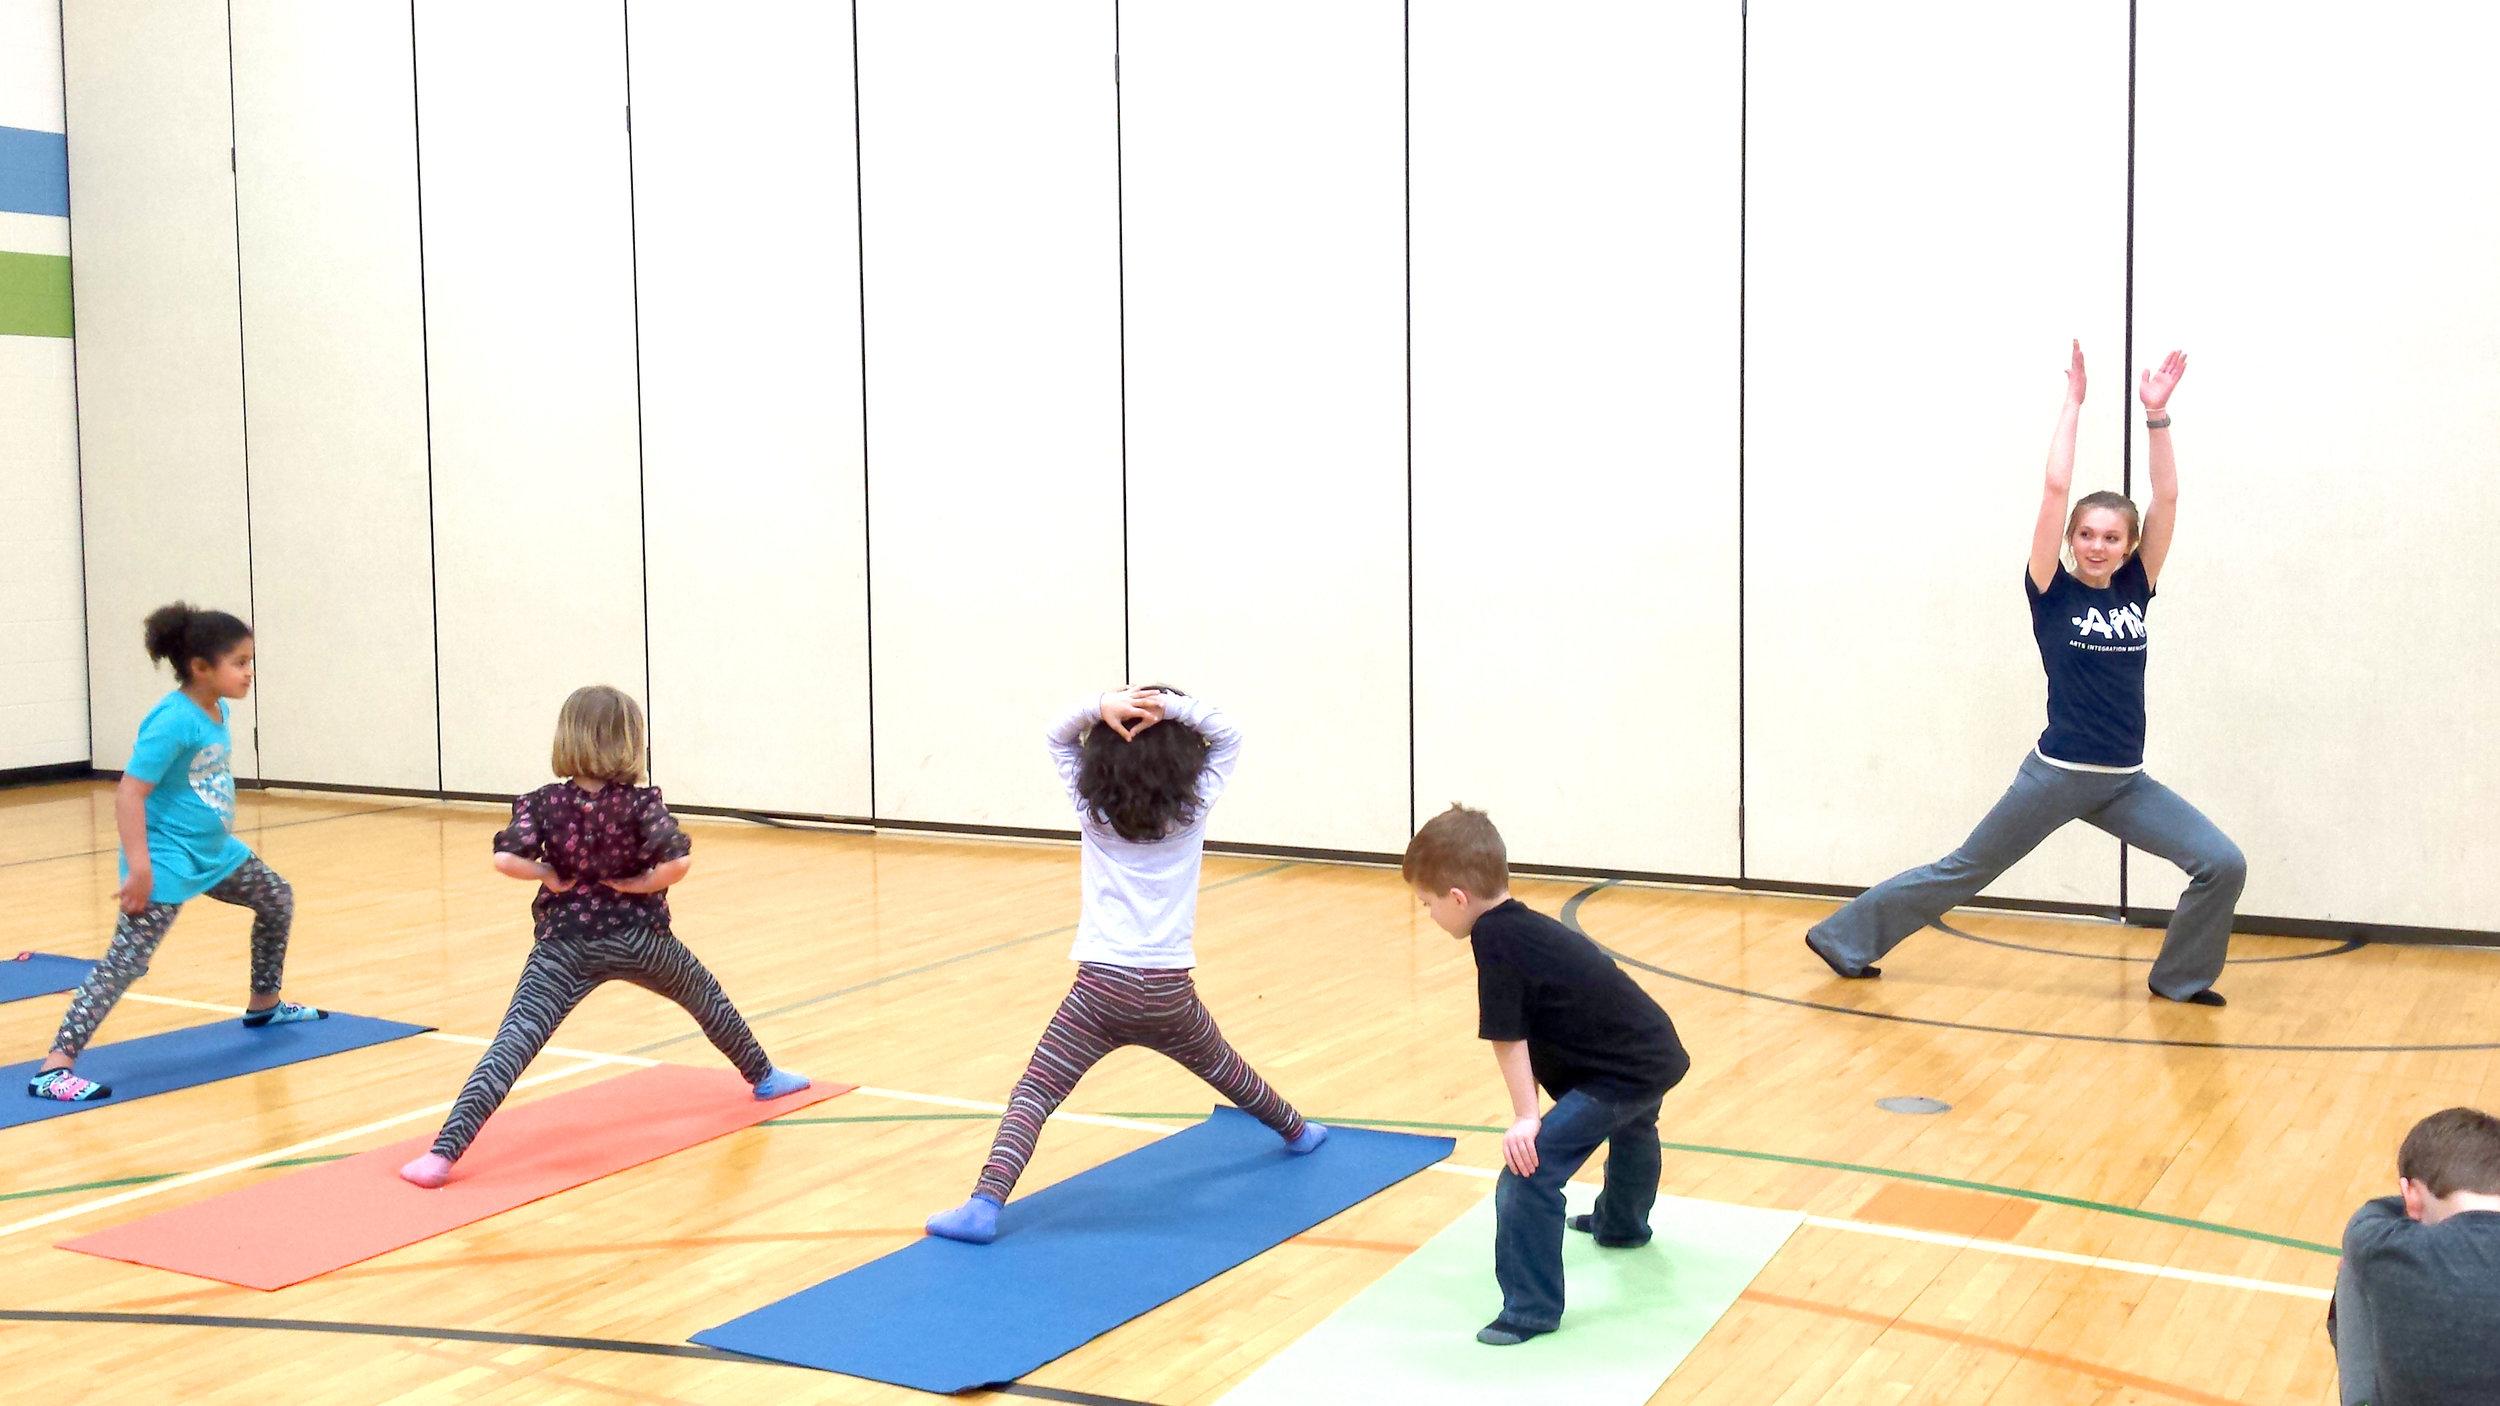 Abby Naumann  UW-Stout Early Childhood Education INTERNSHIP: Yoga, Rocky's K-2 Afterschool Program, River Heights Elementary